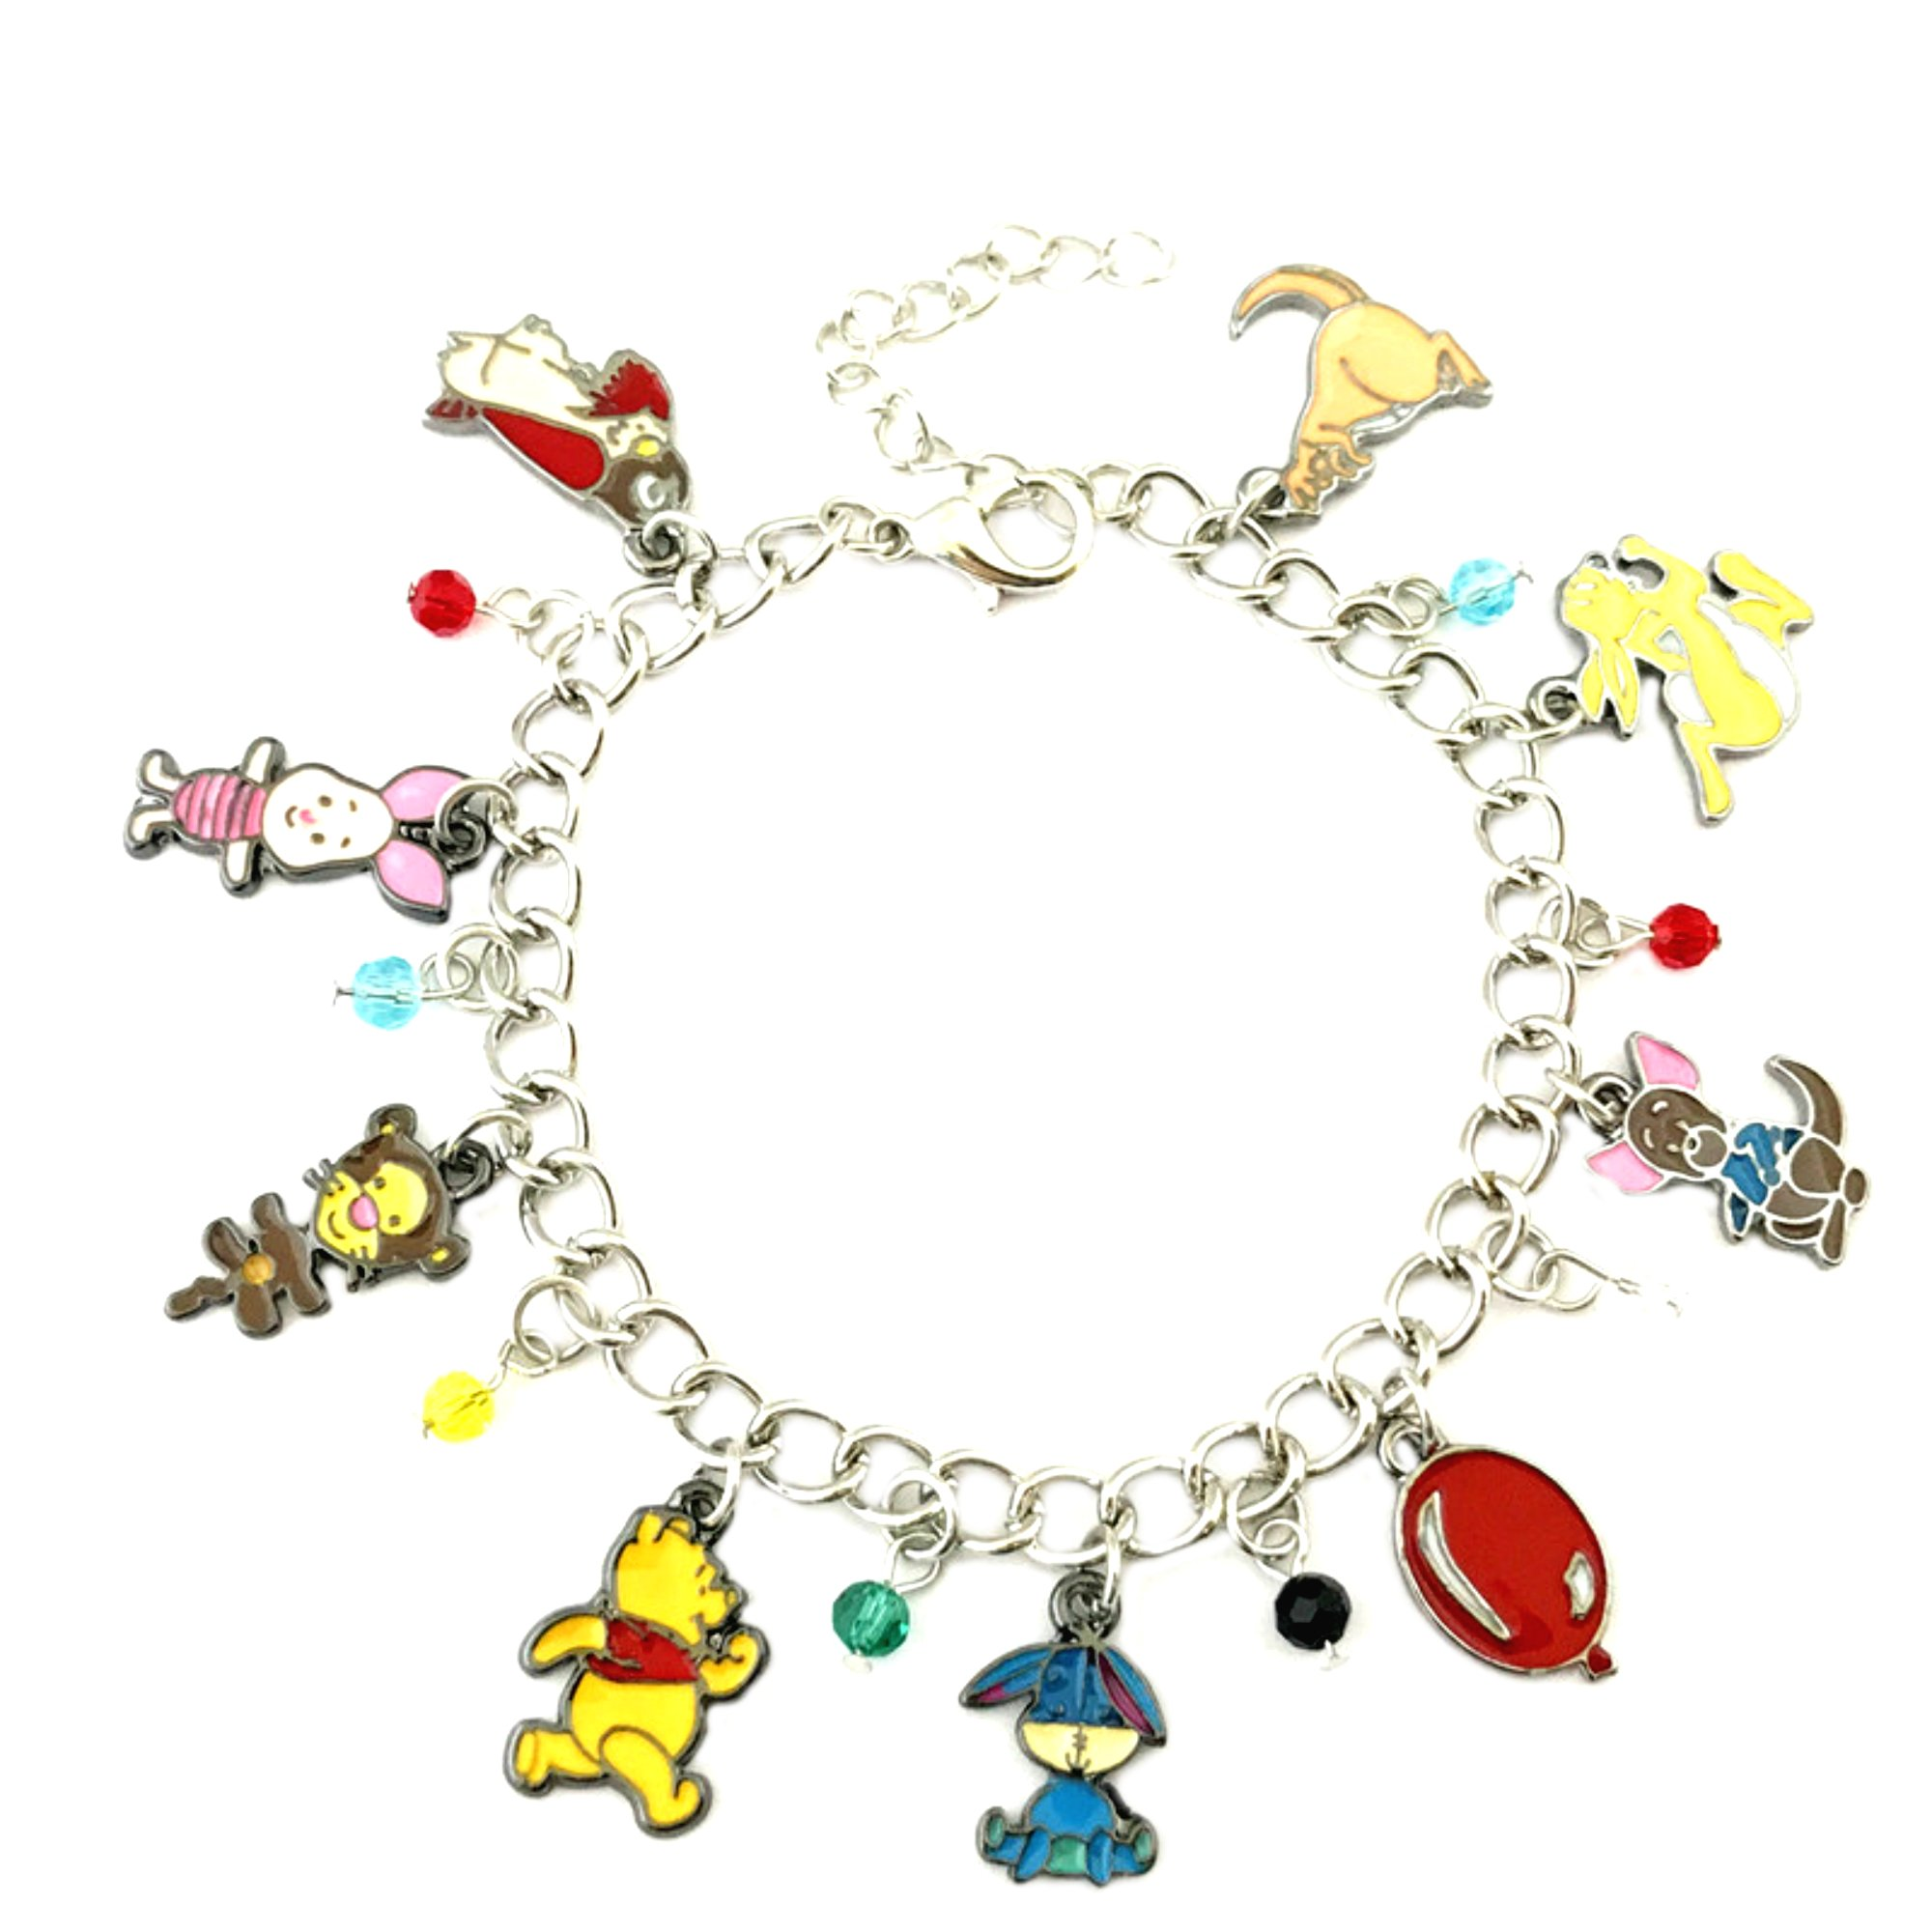 Superheroes Brand Winnie the Pooh Disney Classic Cartoon Charm Bracelet w/Gift Box Movies Premium Quality Cosplay Jewelry Series by Superheroes Brand